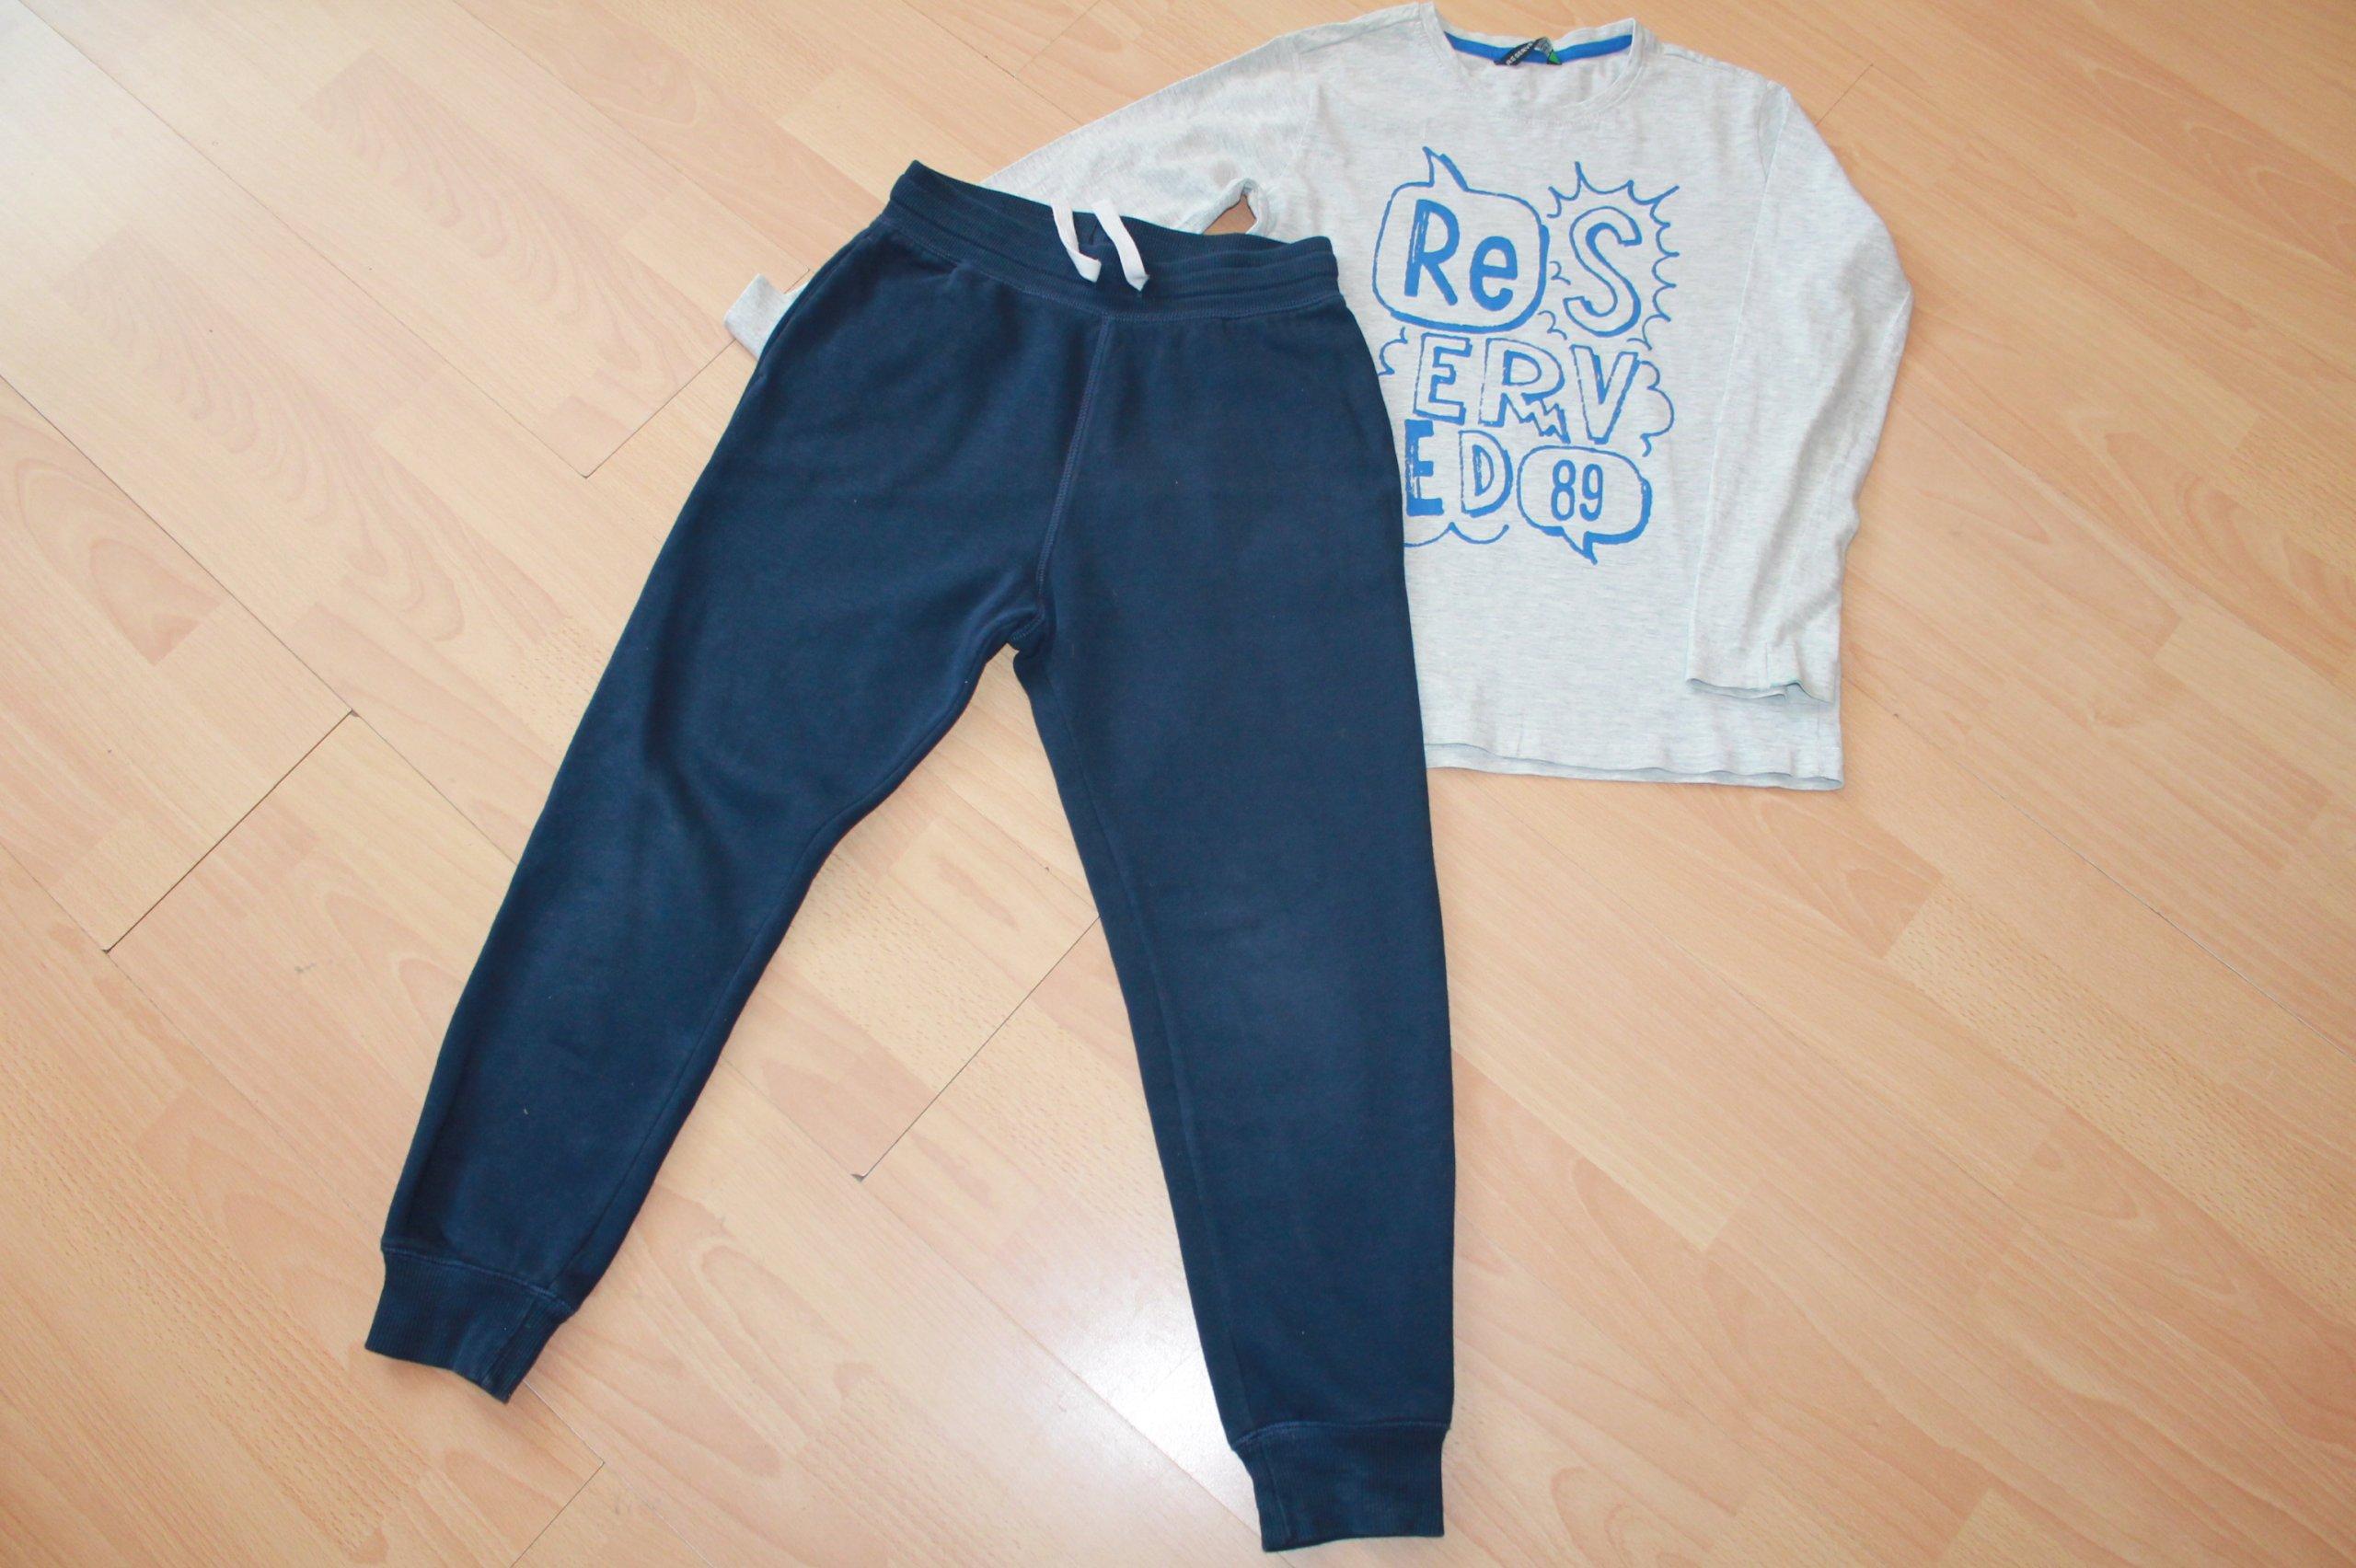 30cf4061f13b3 Spodnie dresowe H&M+bluzka Reserved gratis 134 - 7219460360 ...